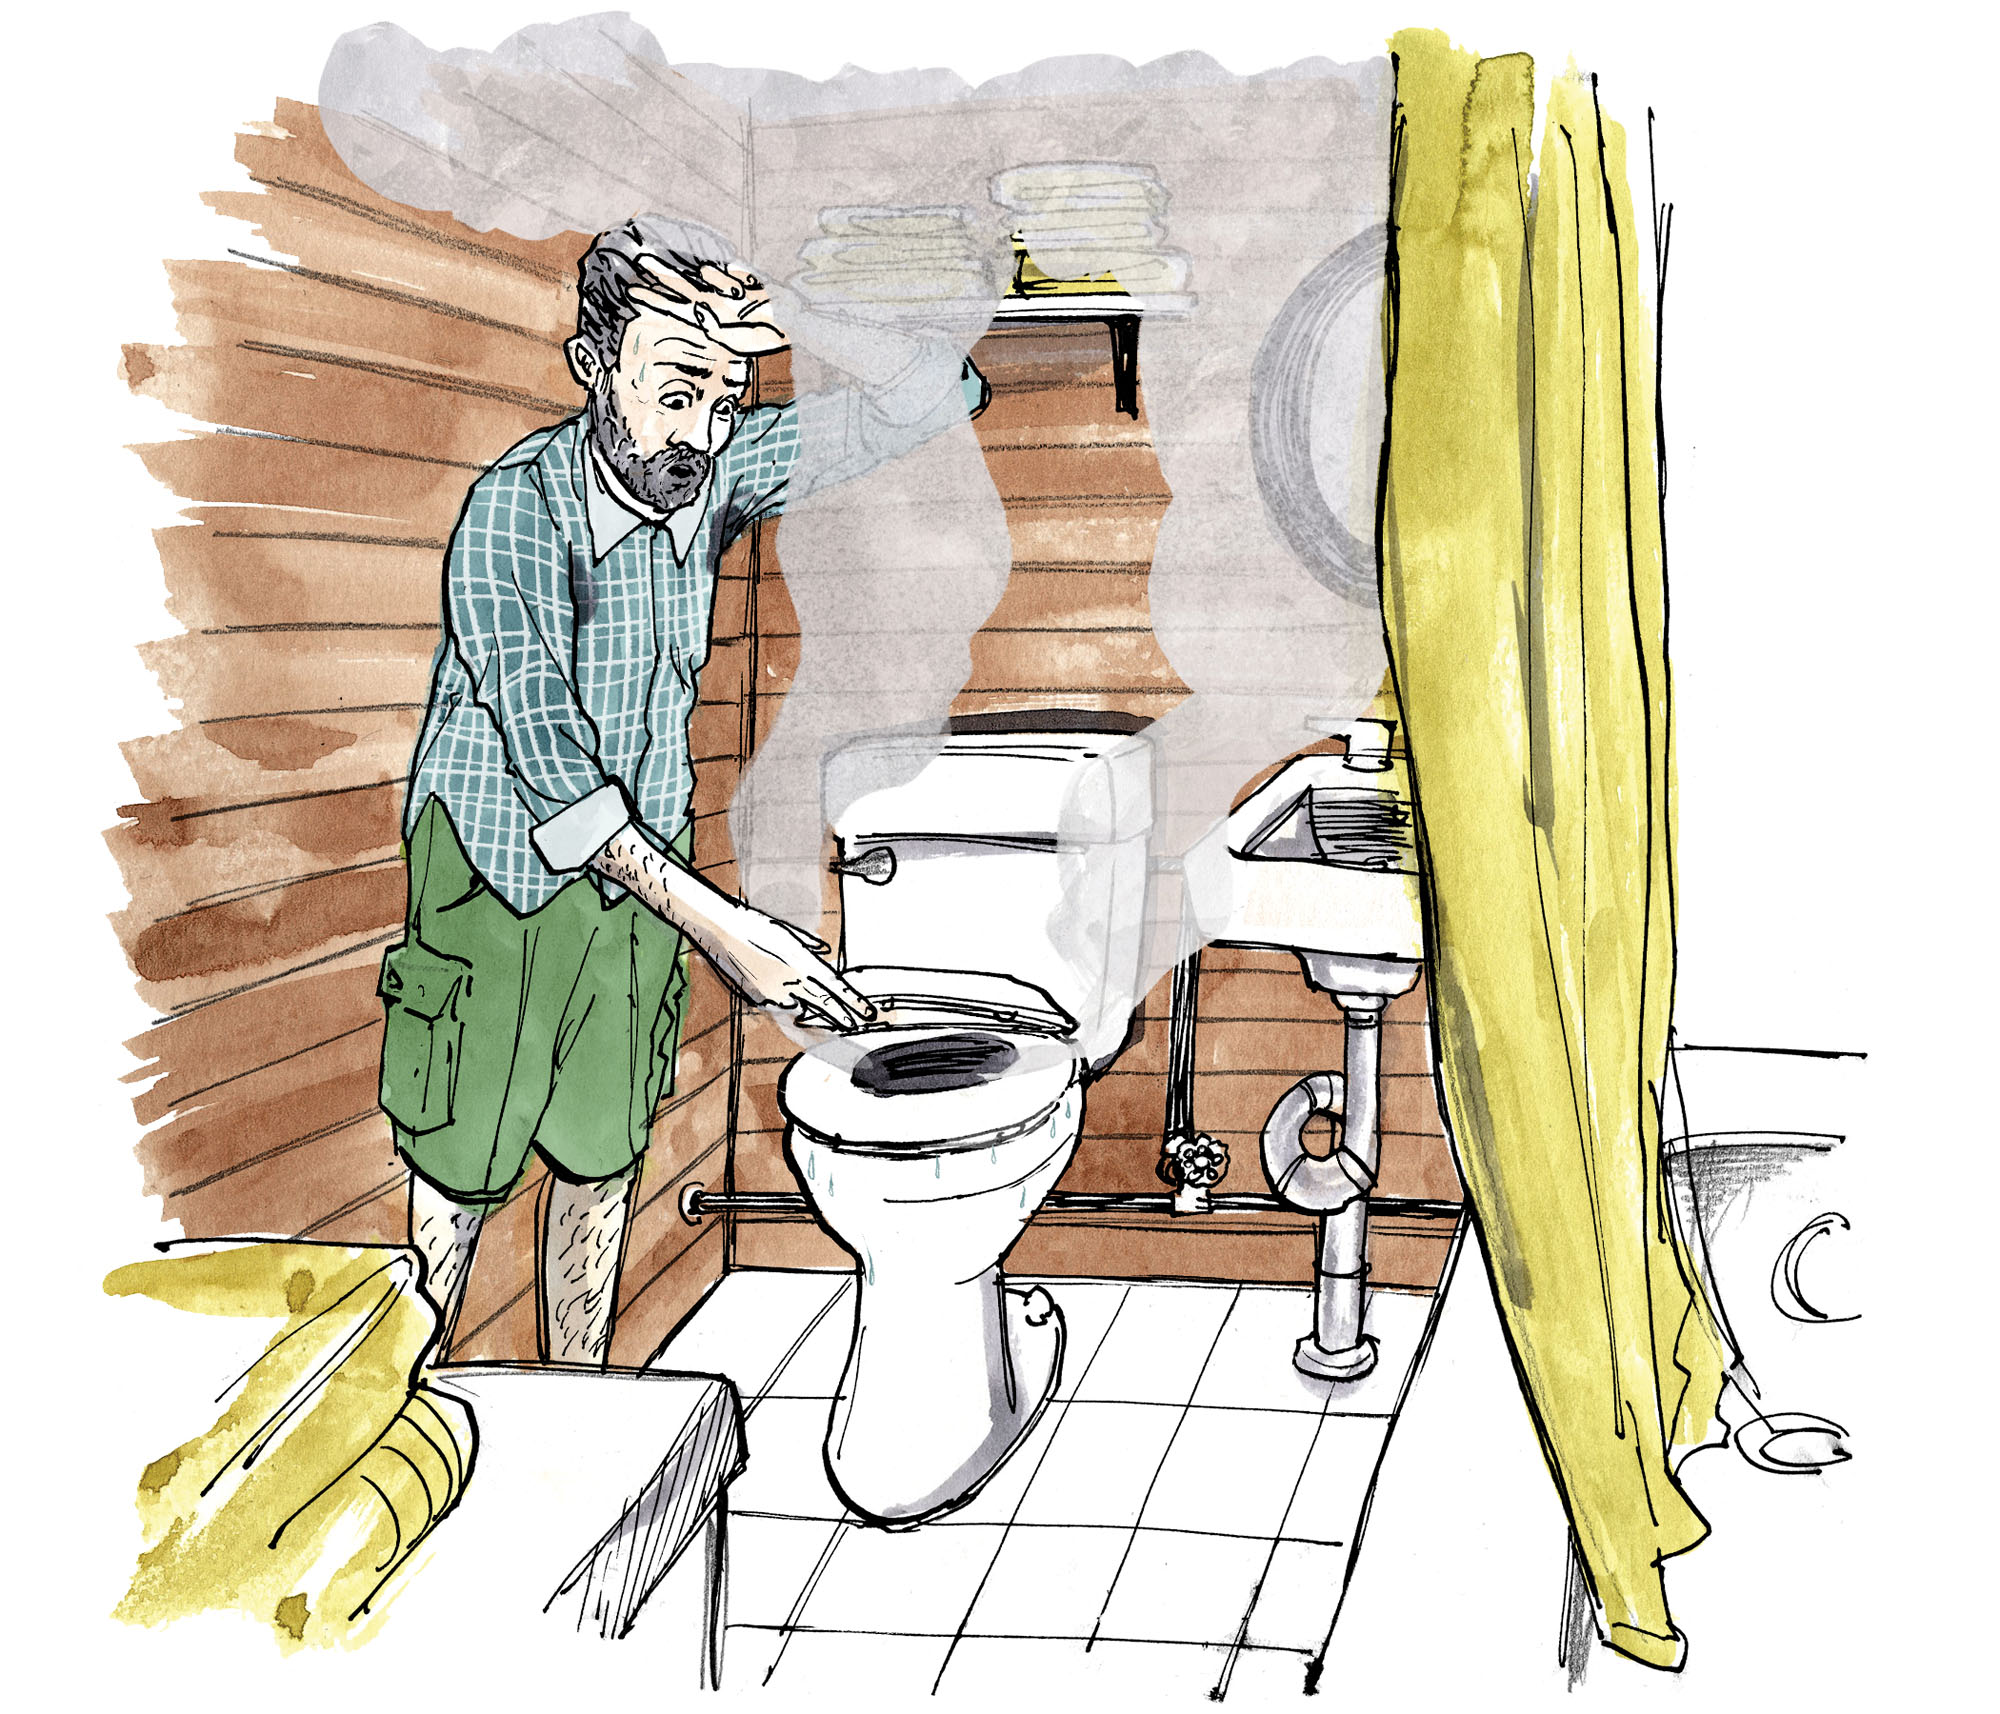 hot toilet seat